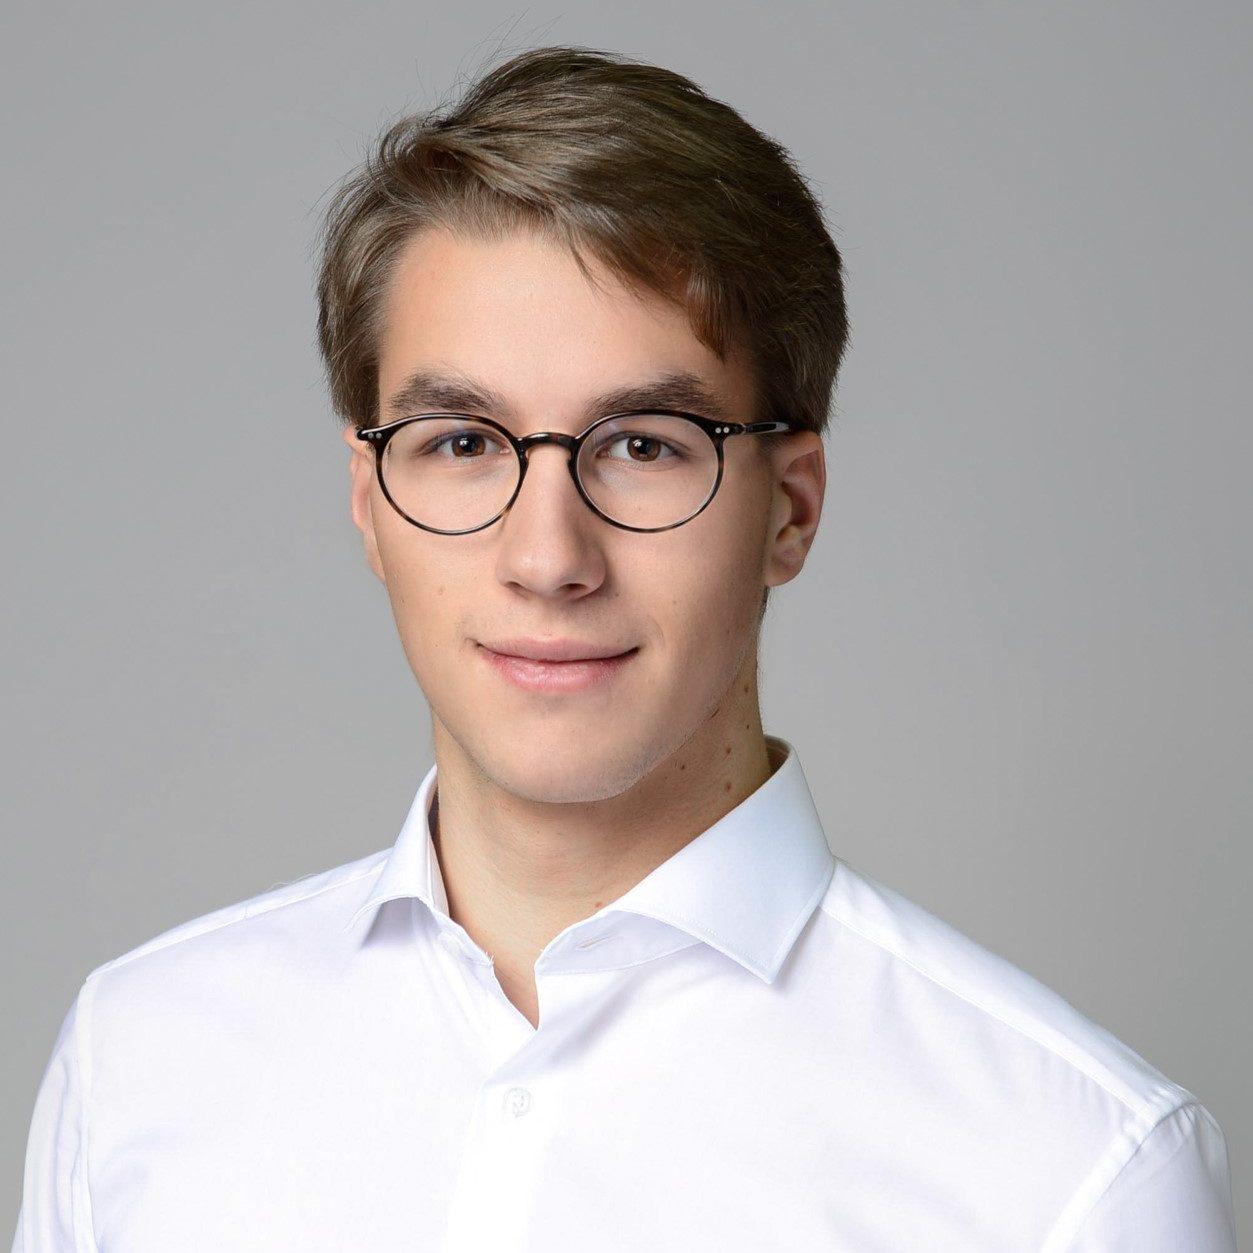 Konstantin Zouboulis